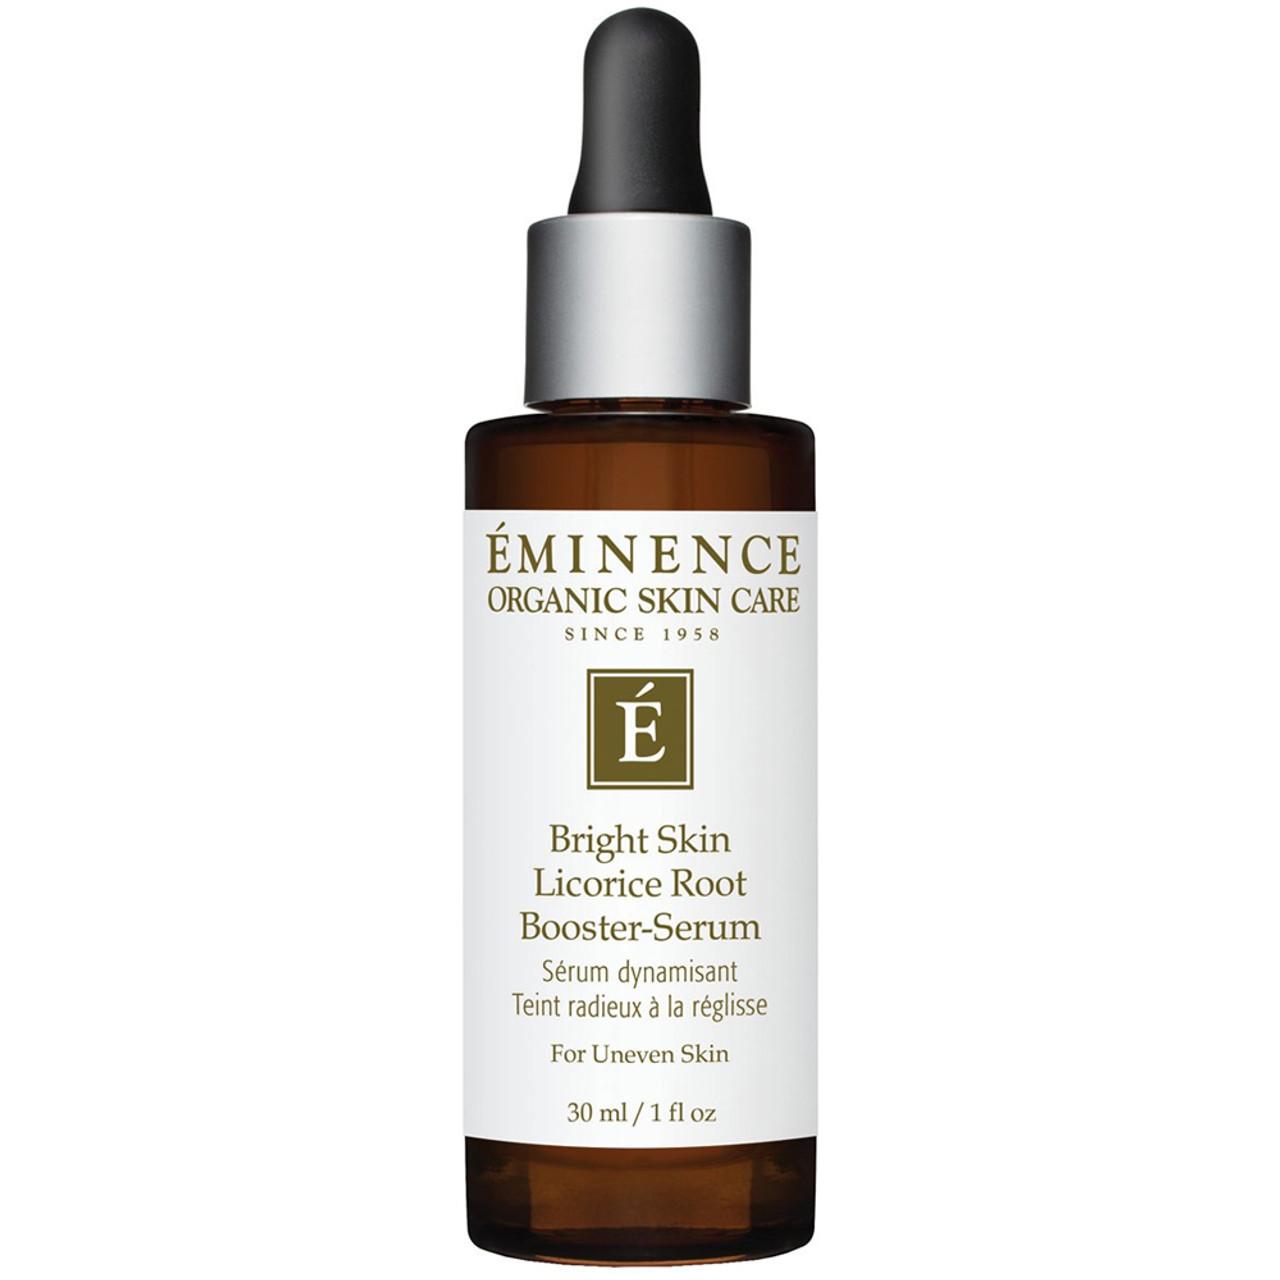 Eminence Bright Skin Licorice Root Booster-Serum BeautifiedYou.com